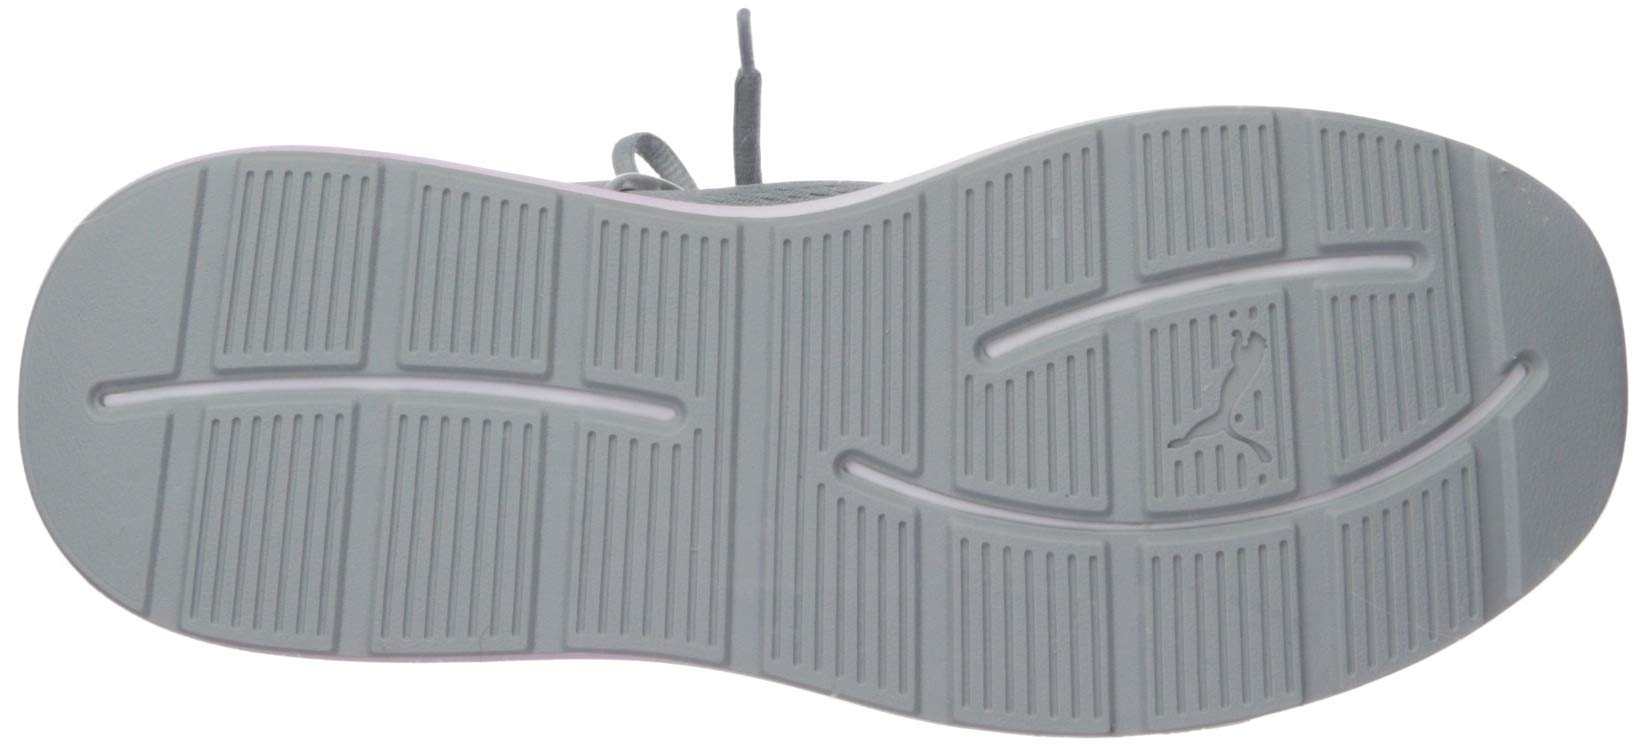 Puma Men s Insurge Eng Mesh Sneaker – THE MEN S TRAINER SUPERSTORE fcfbd79fc